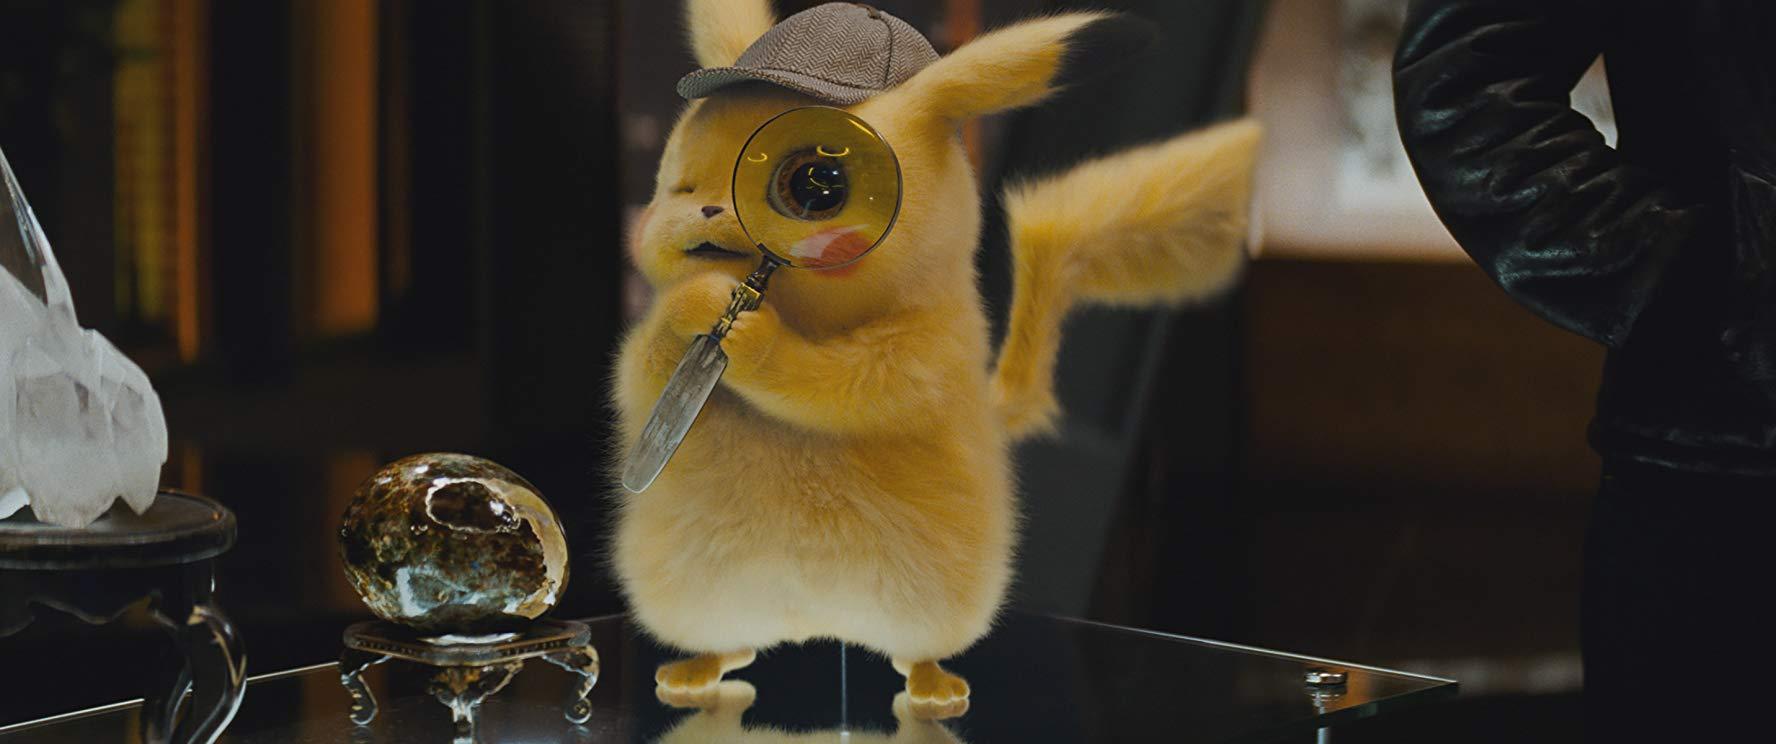 detective pikachu 3